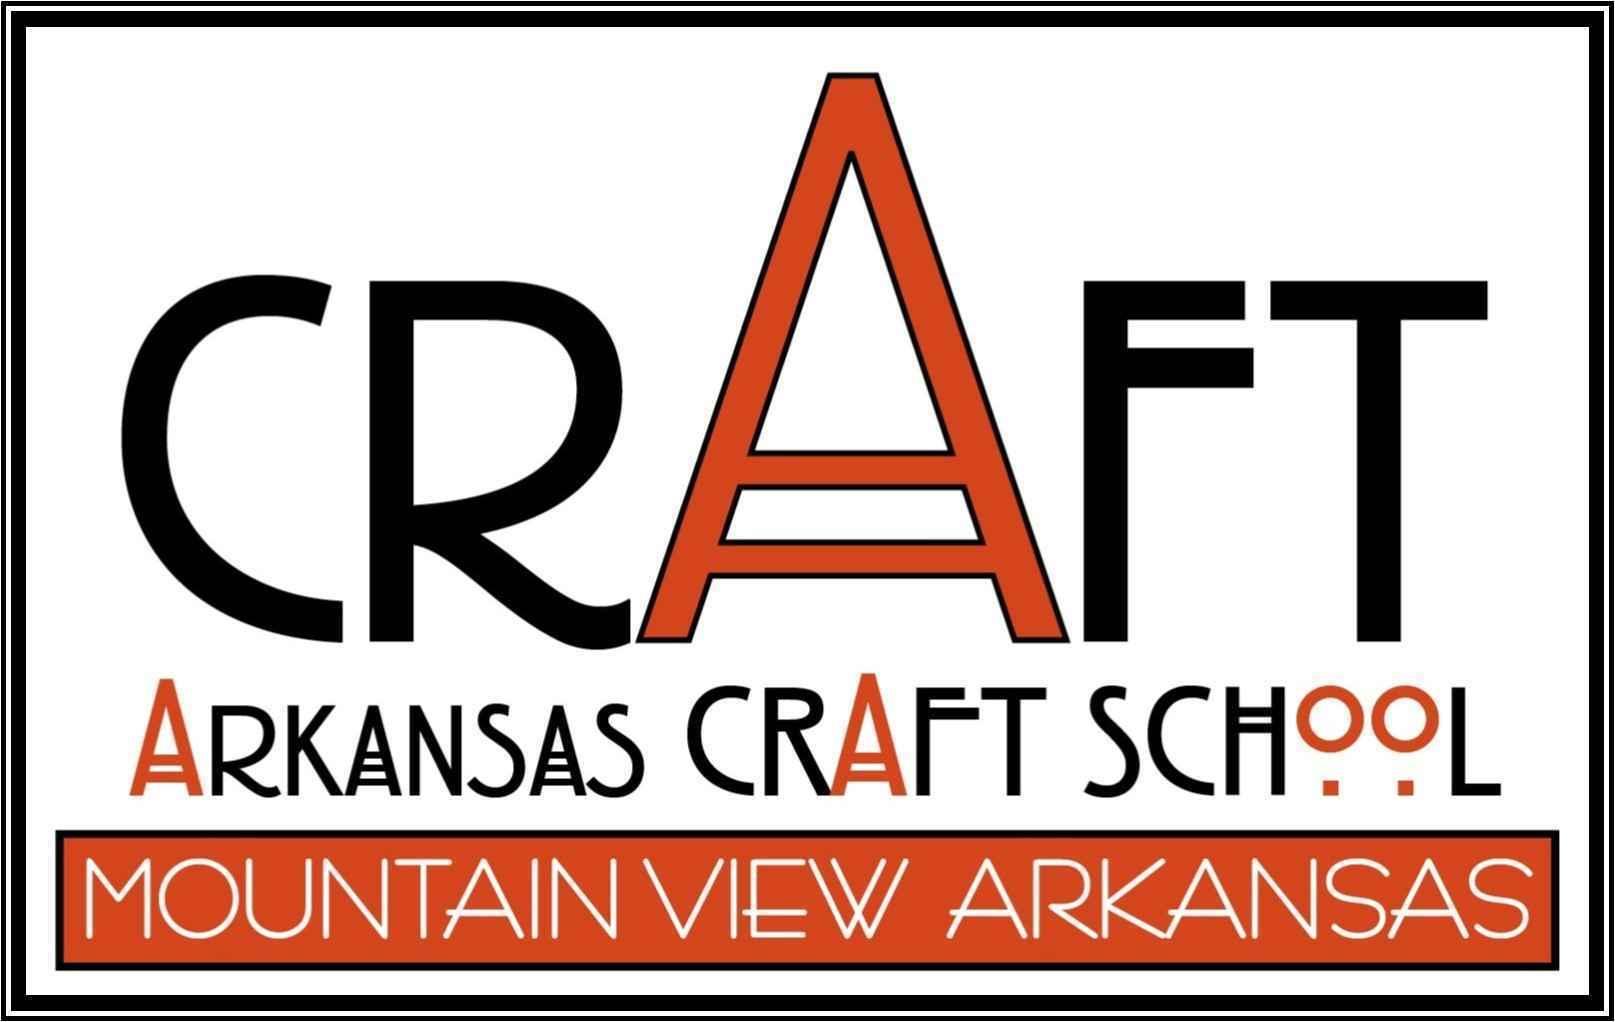 Support the Arkansas Craft School image